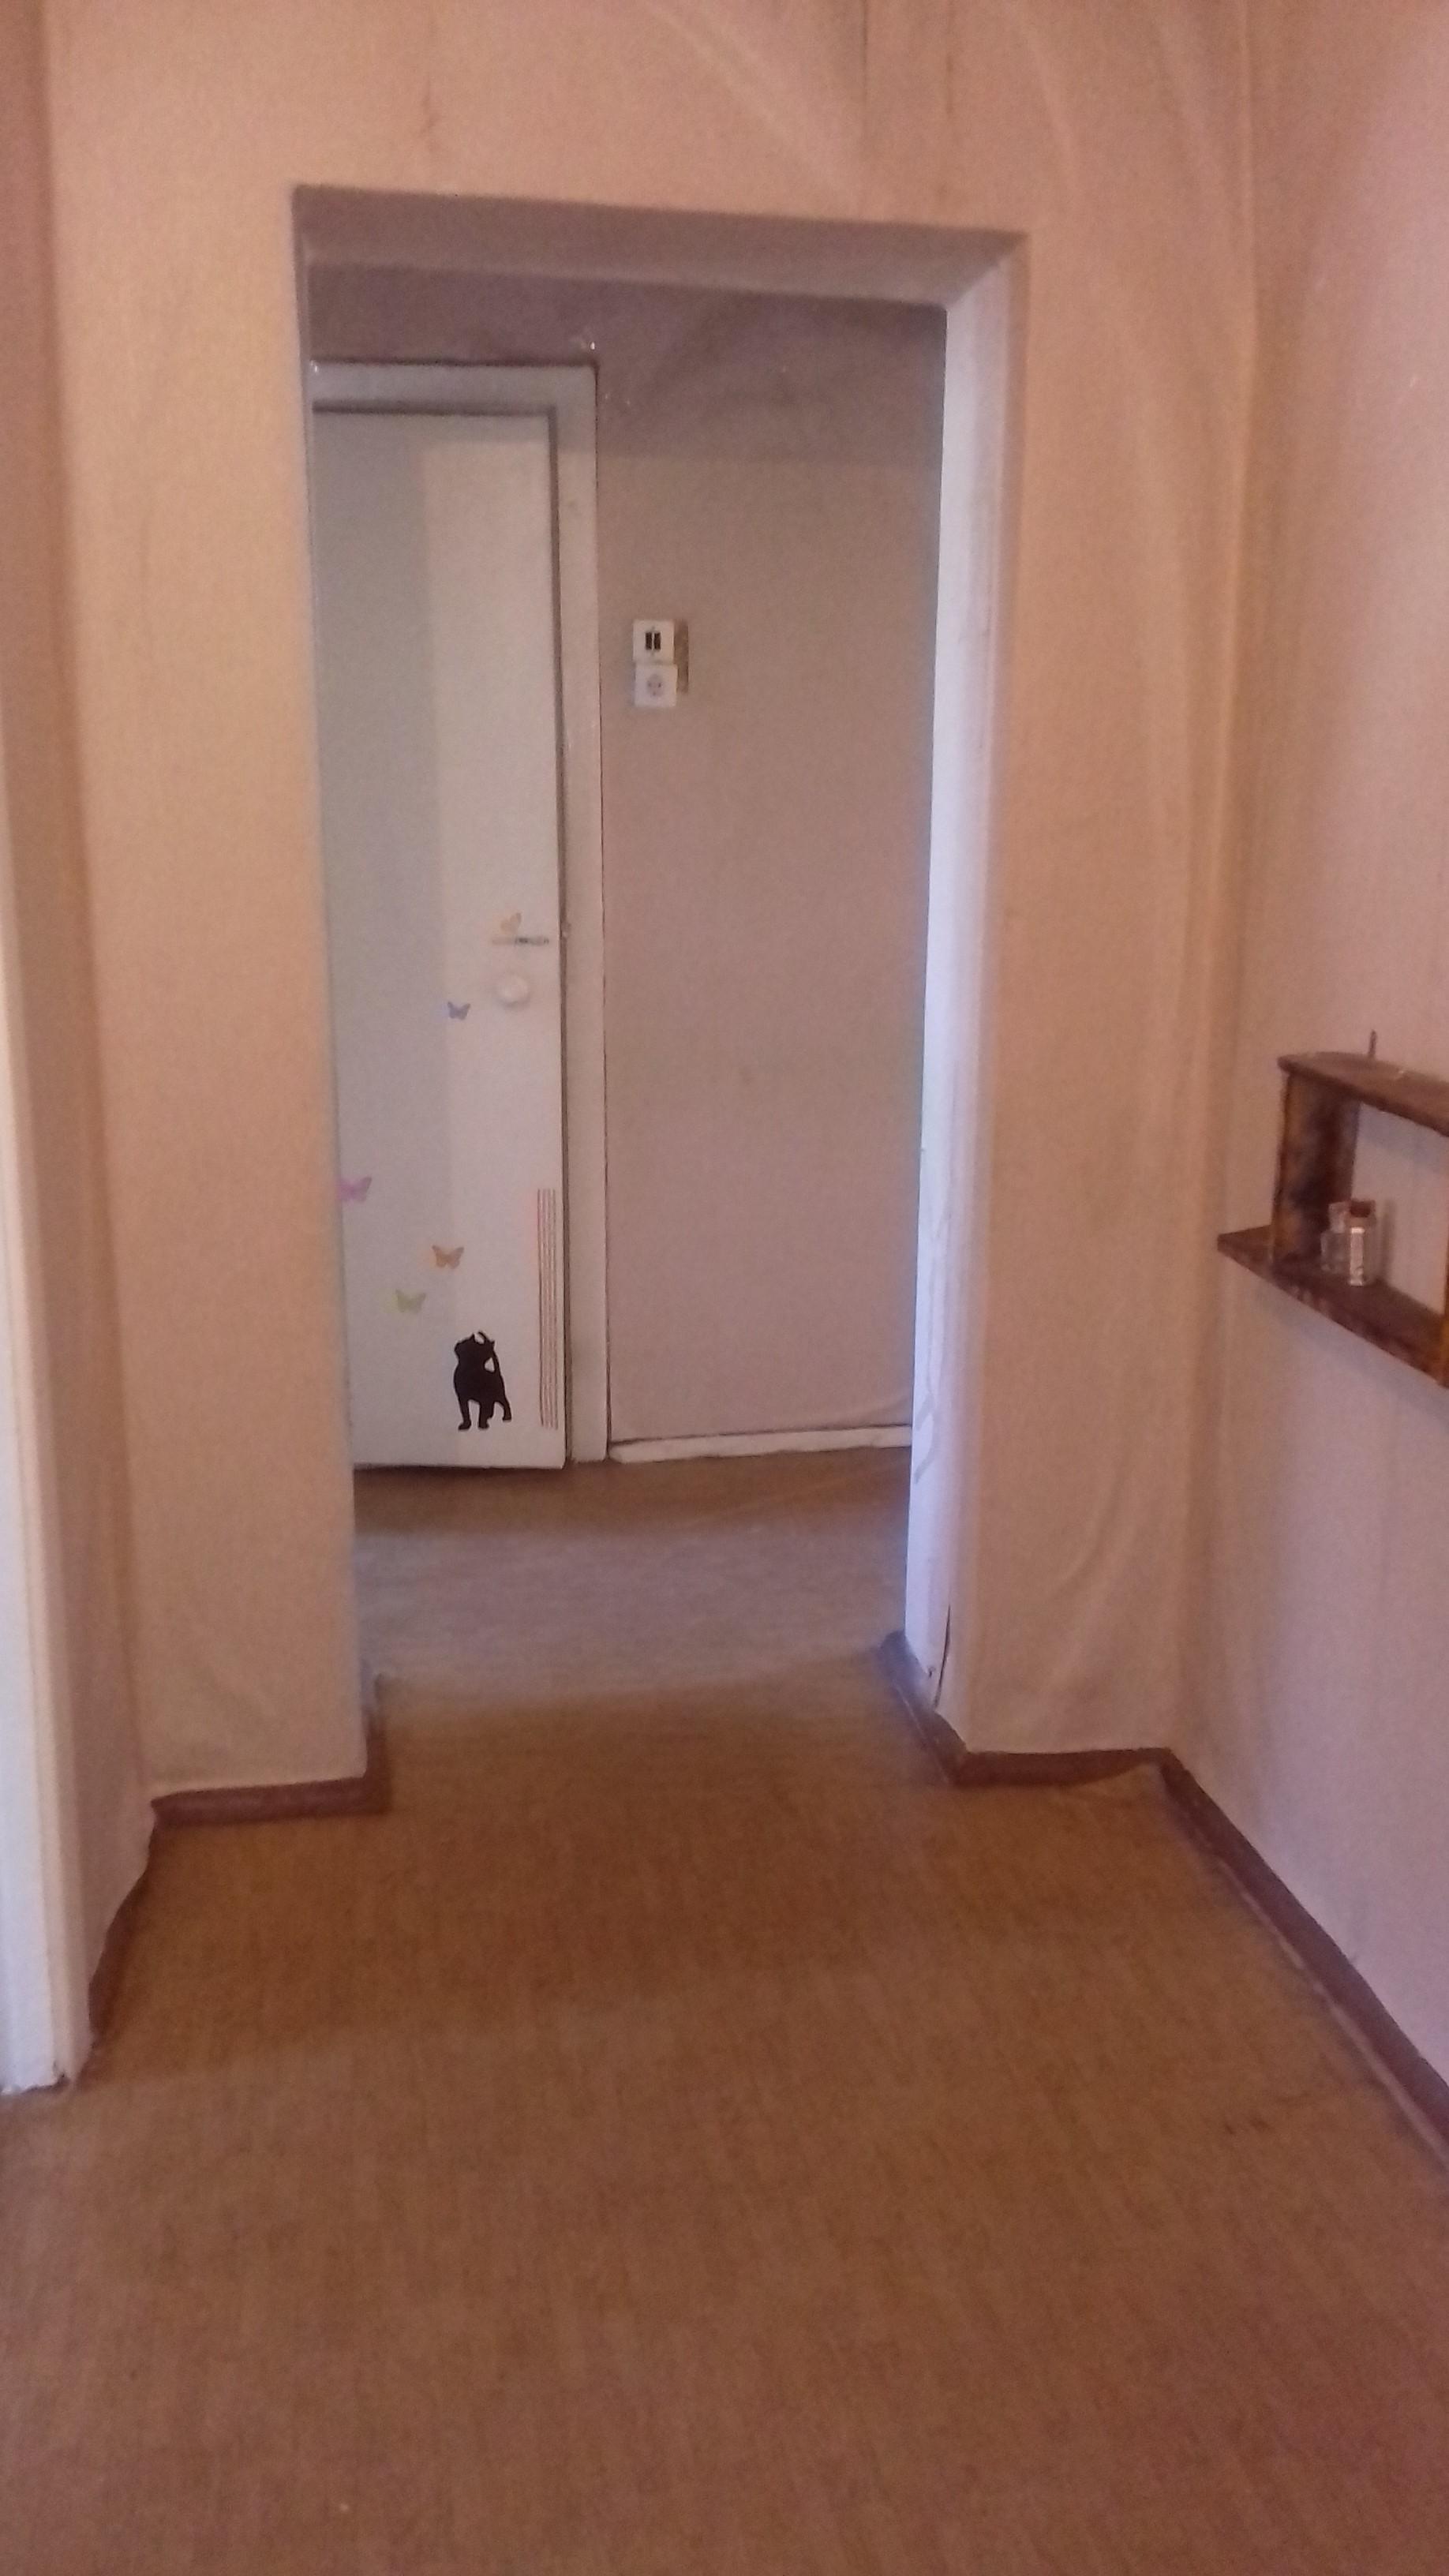 Двухкомнатная квартира - пер. Машиниста, д. 9